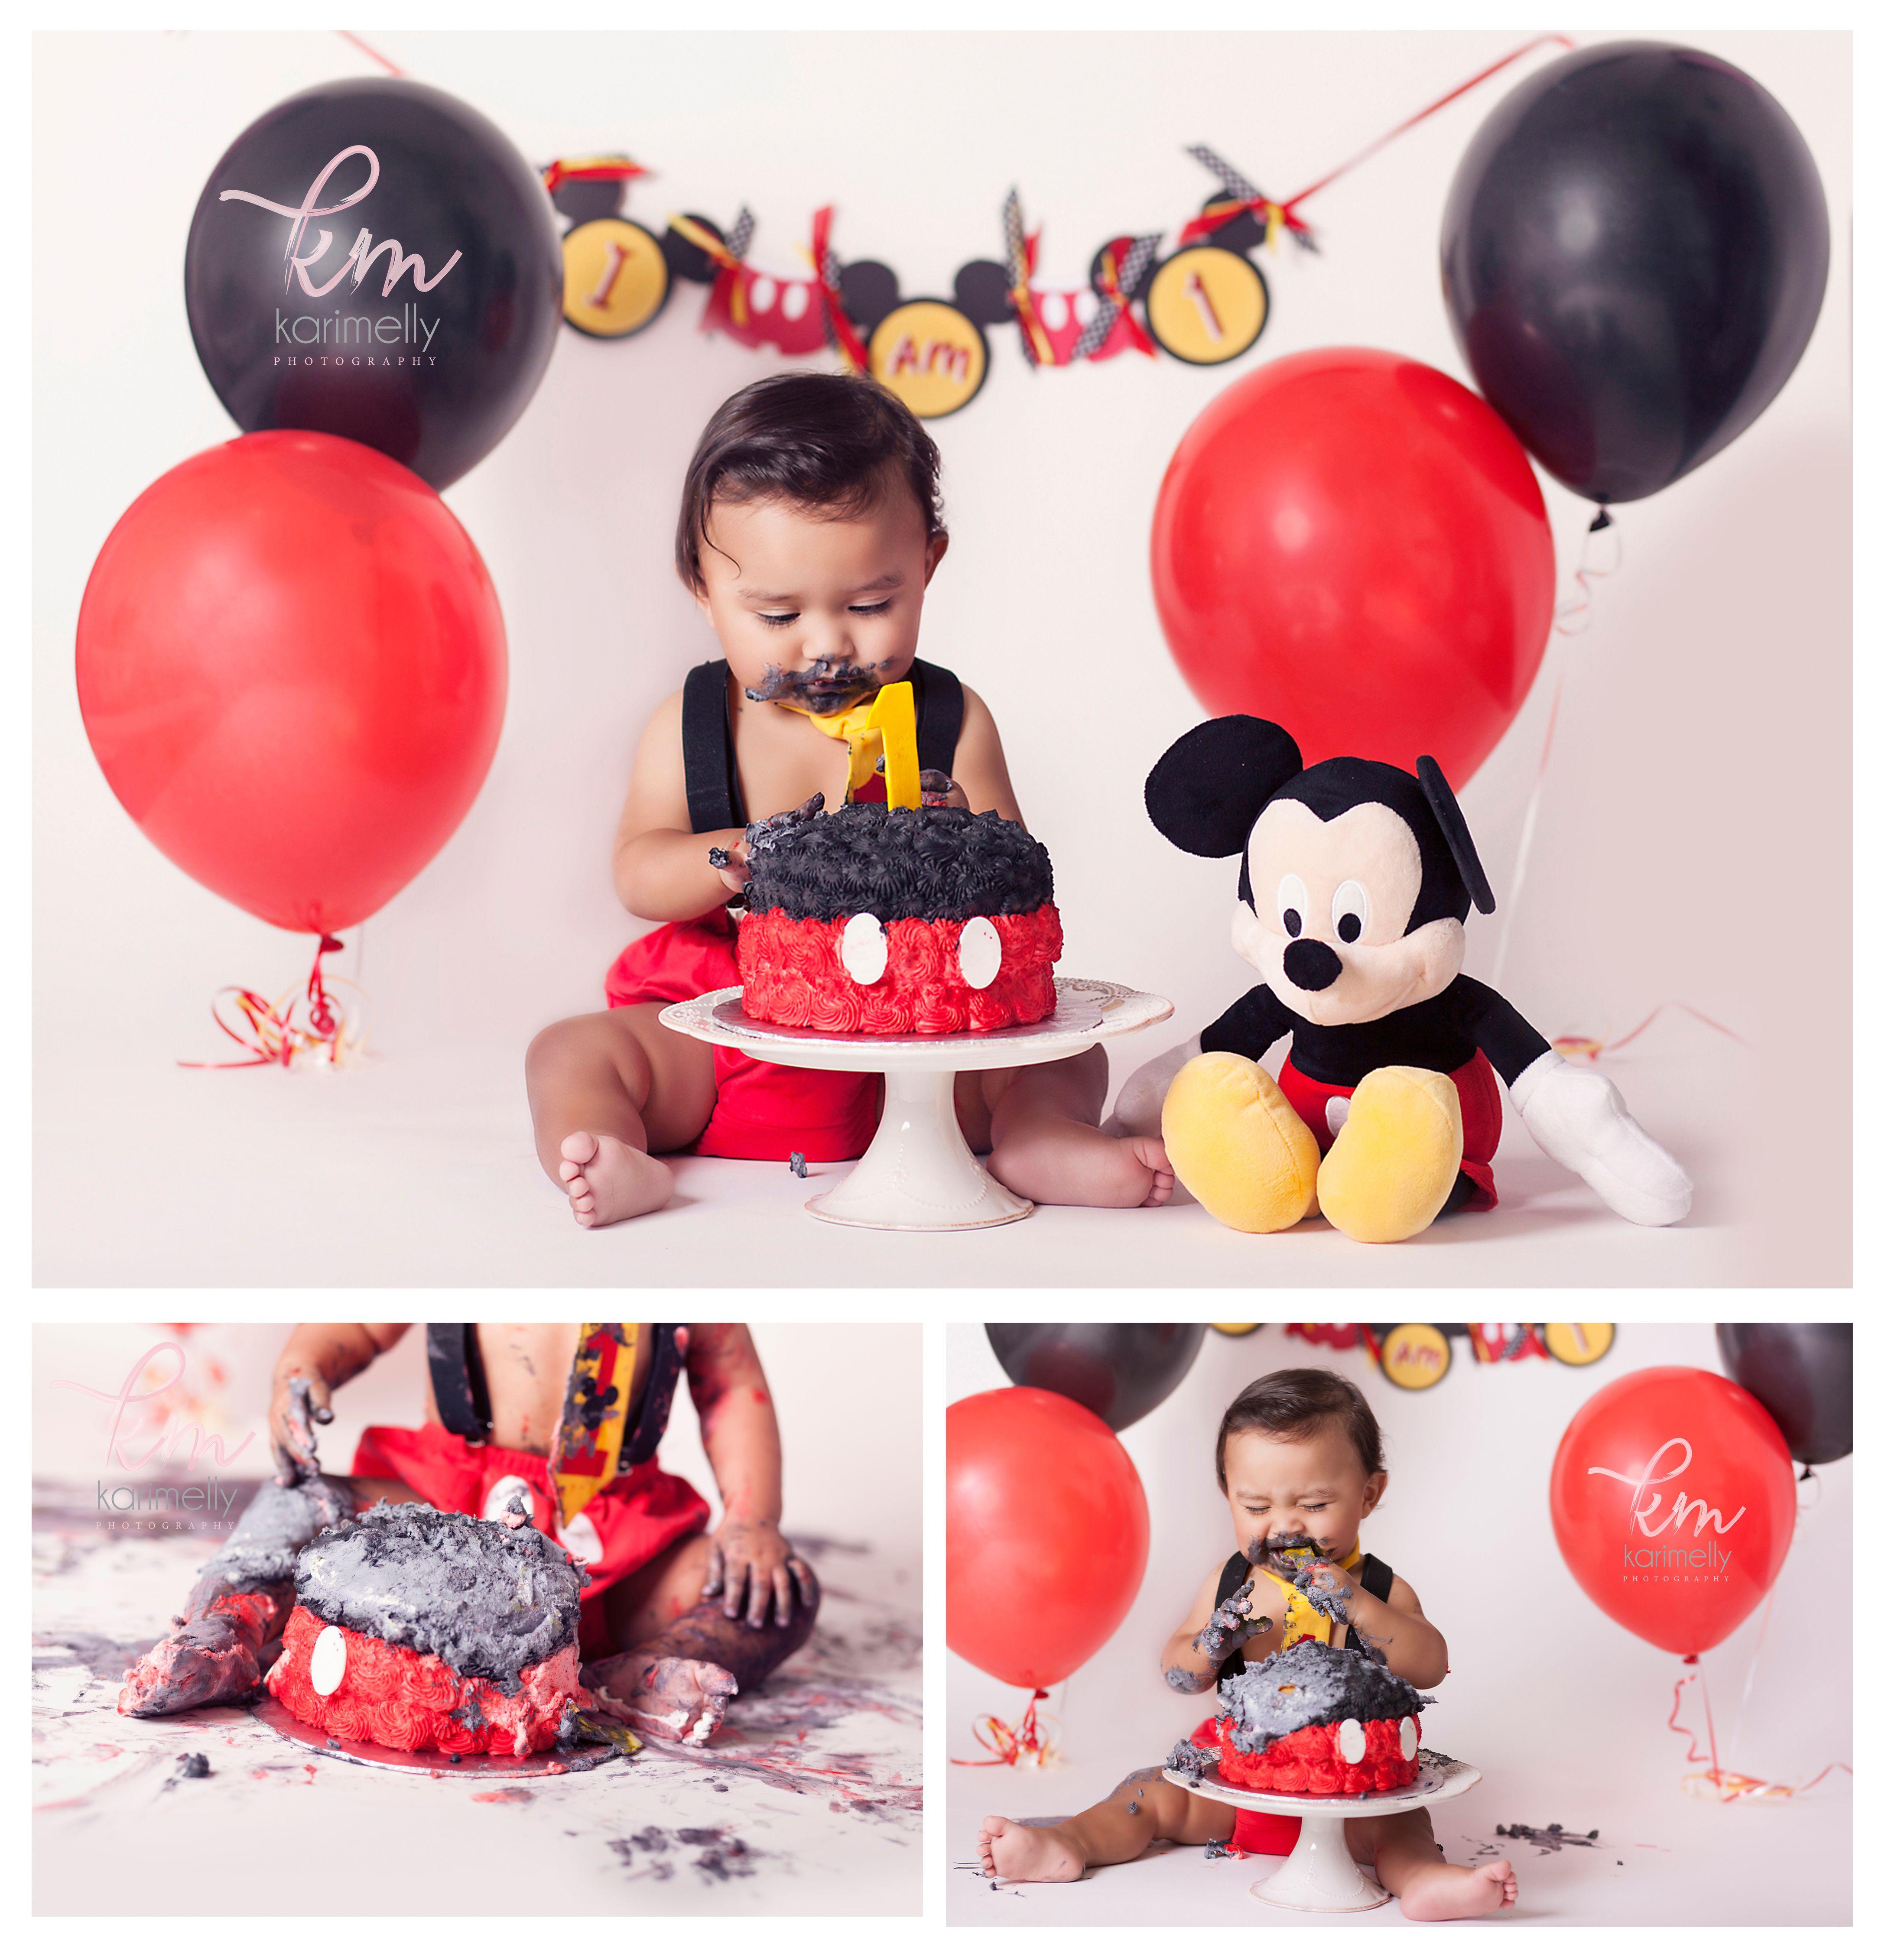 mickey mouse themed cake smash Cake smash photo sessions